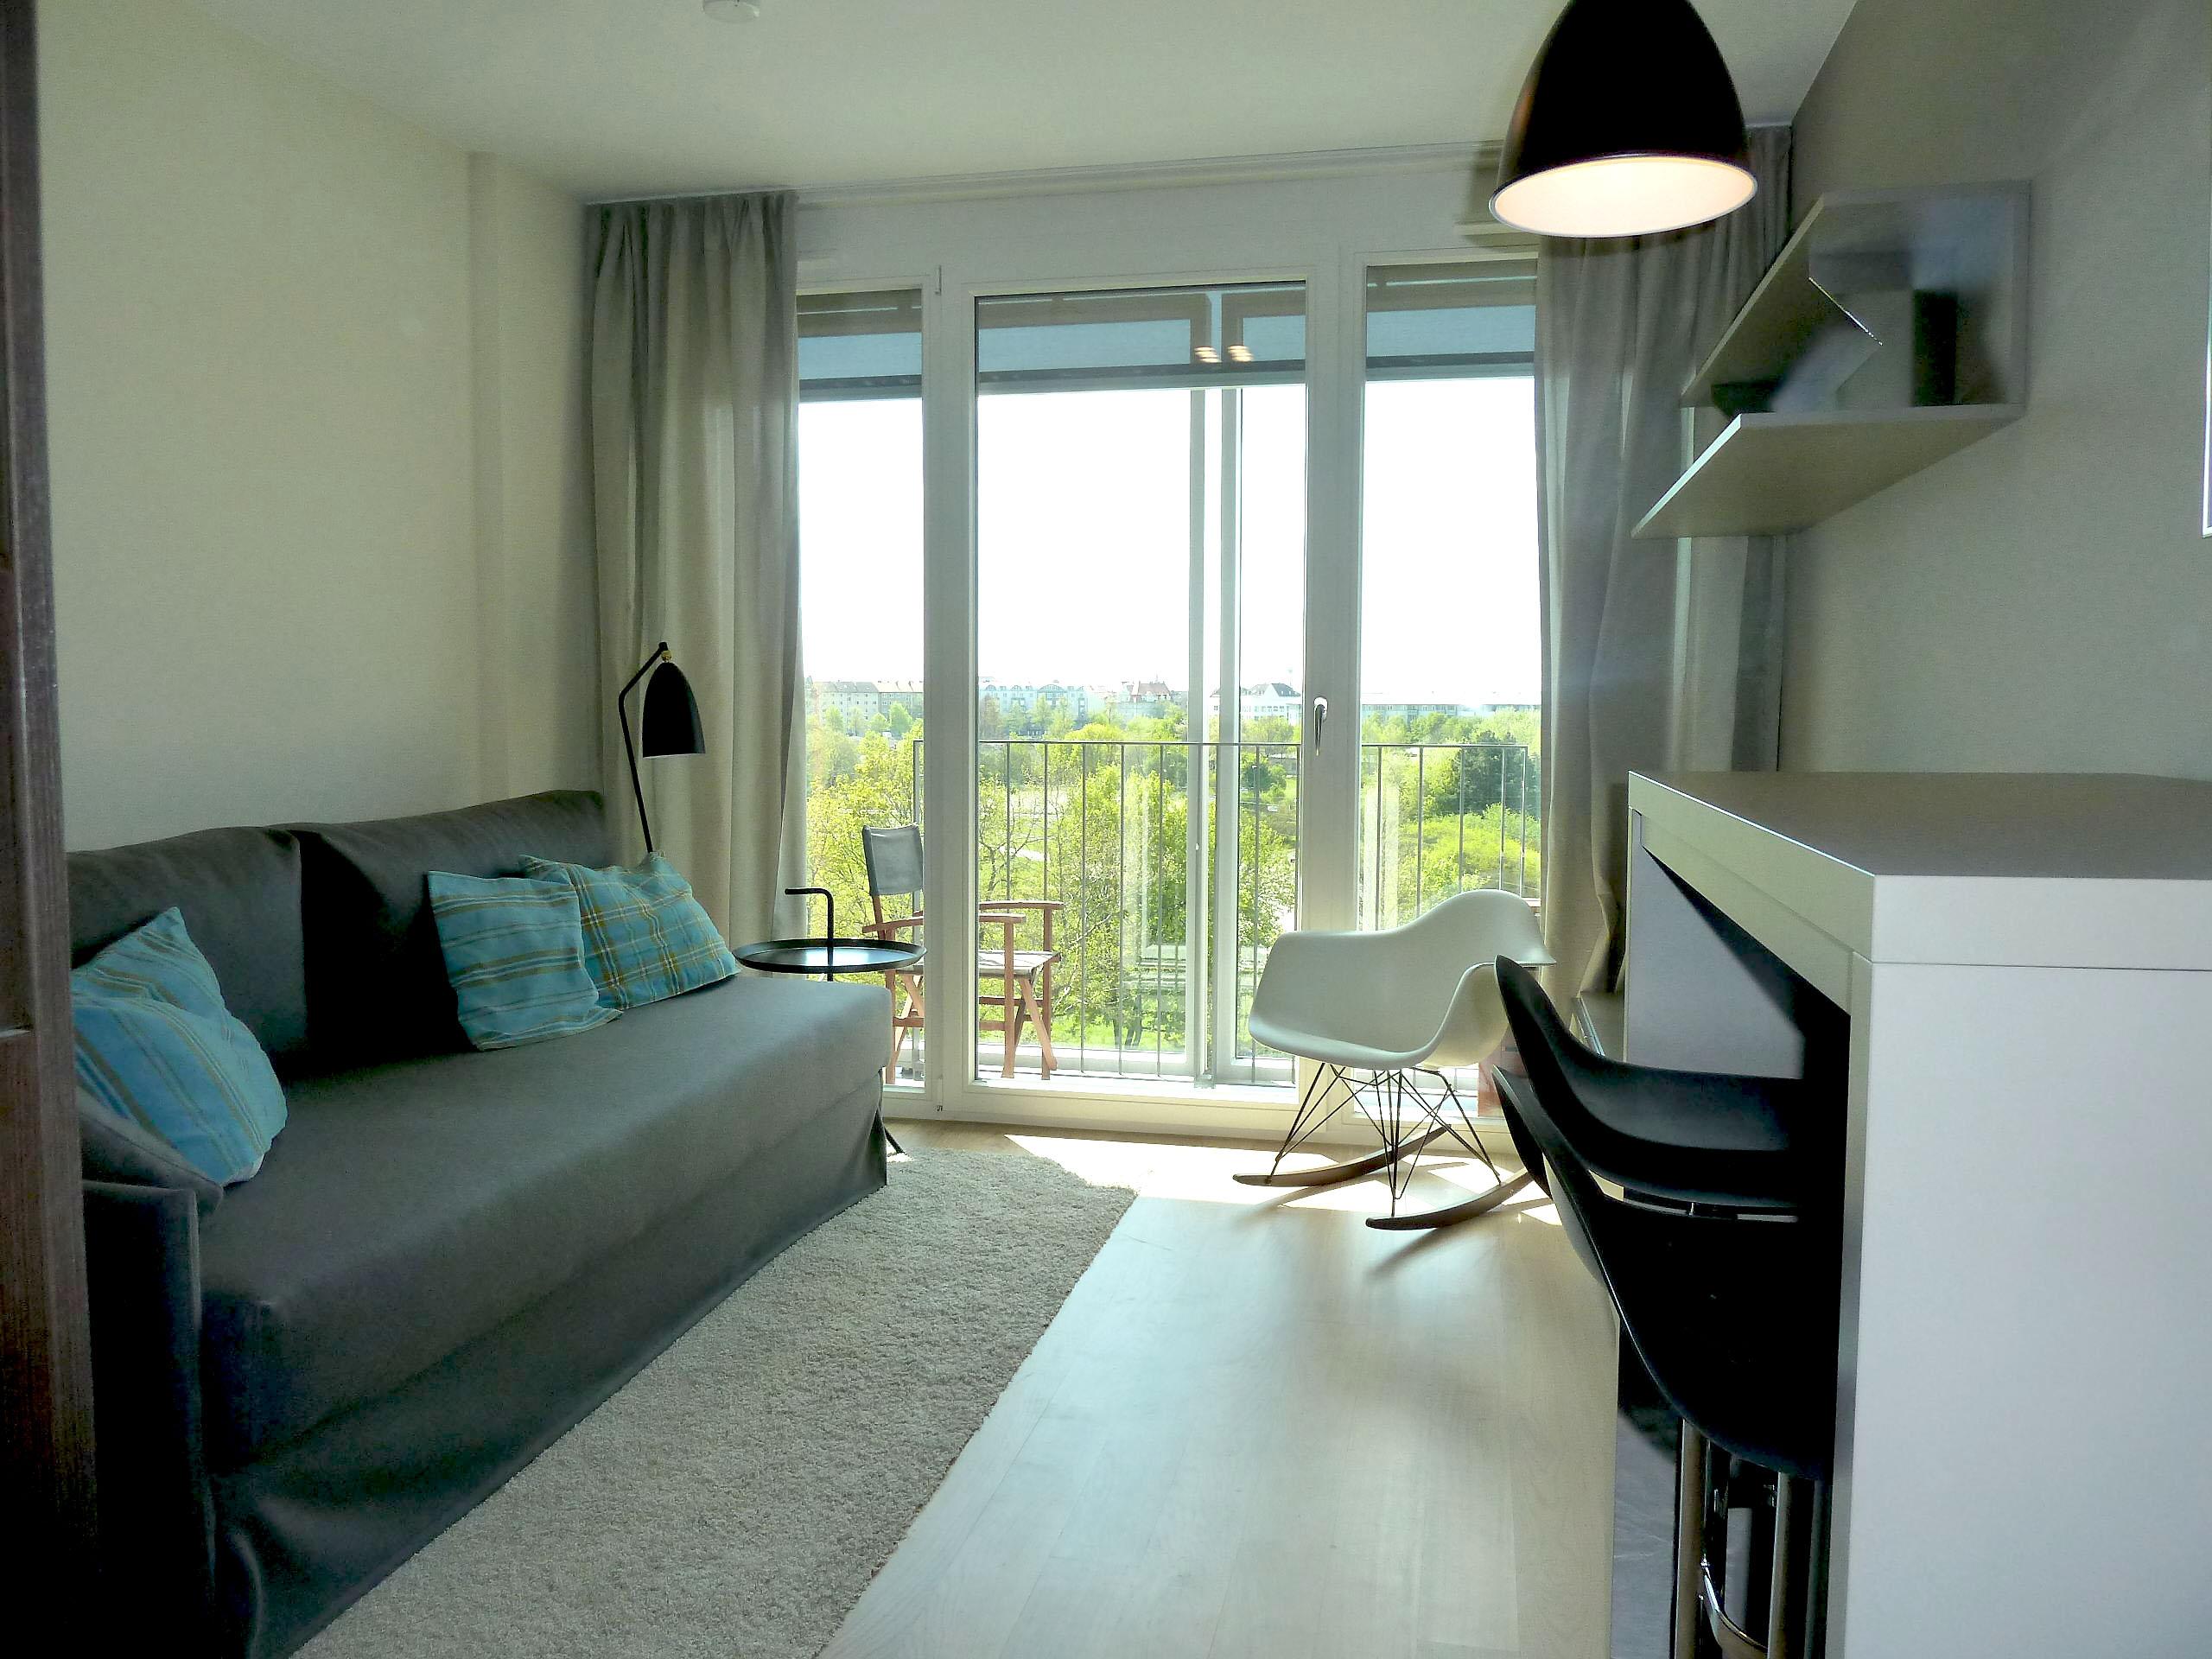 wohnen im studiomuc h25 immobilien. Black Bedroom Furniture Sets. Home Design Ideas